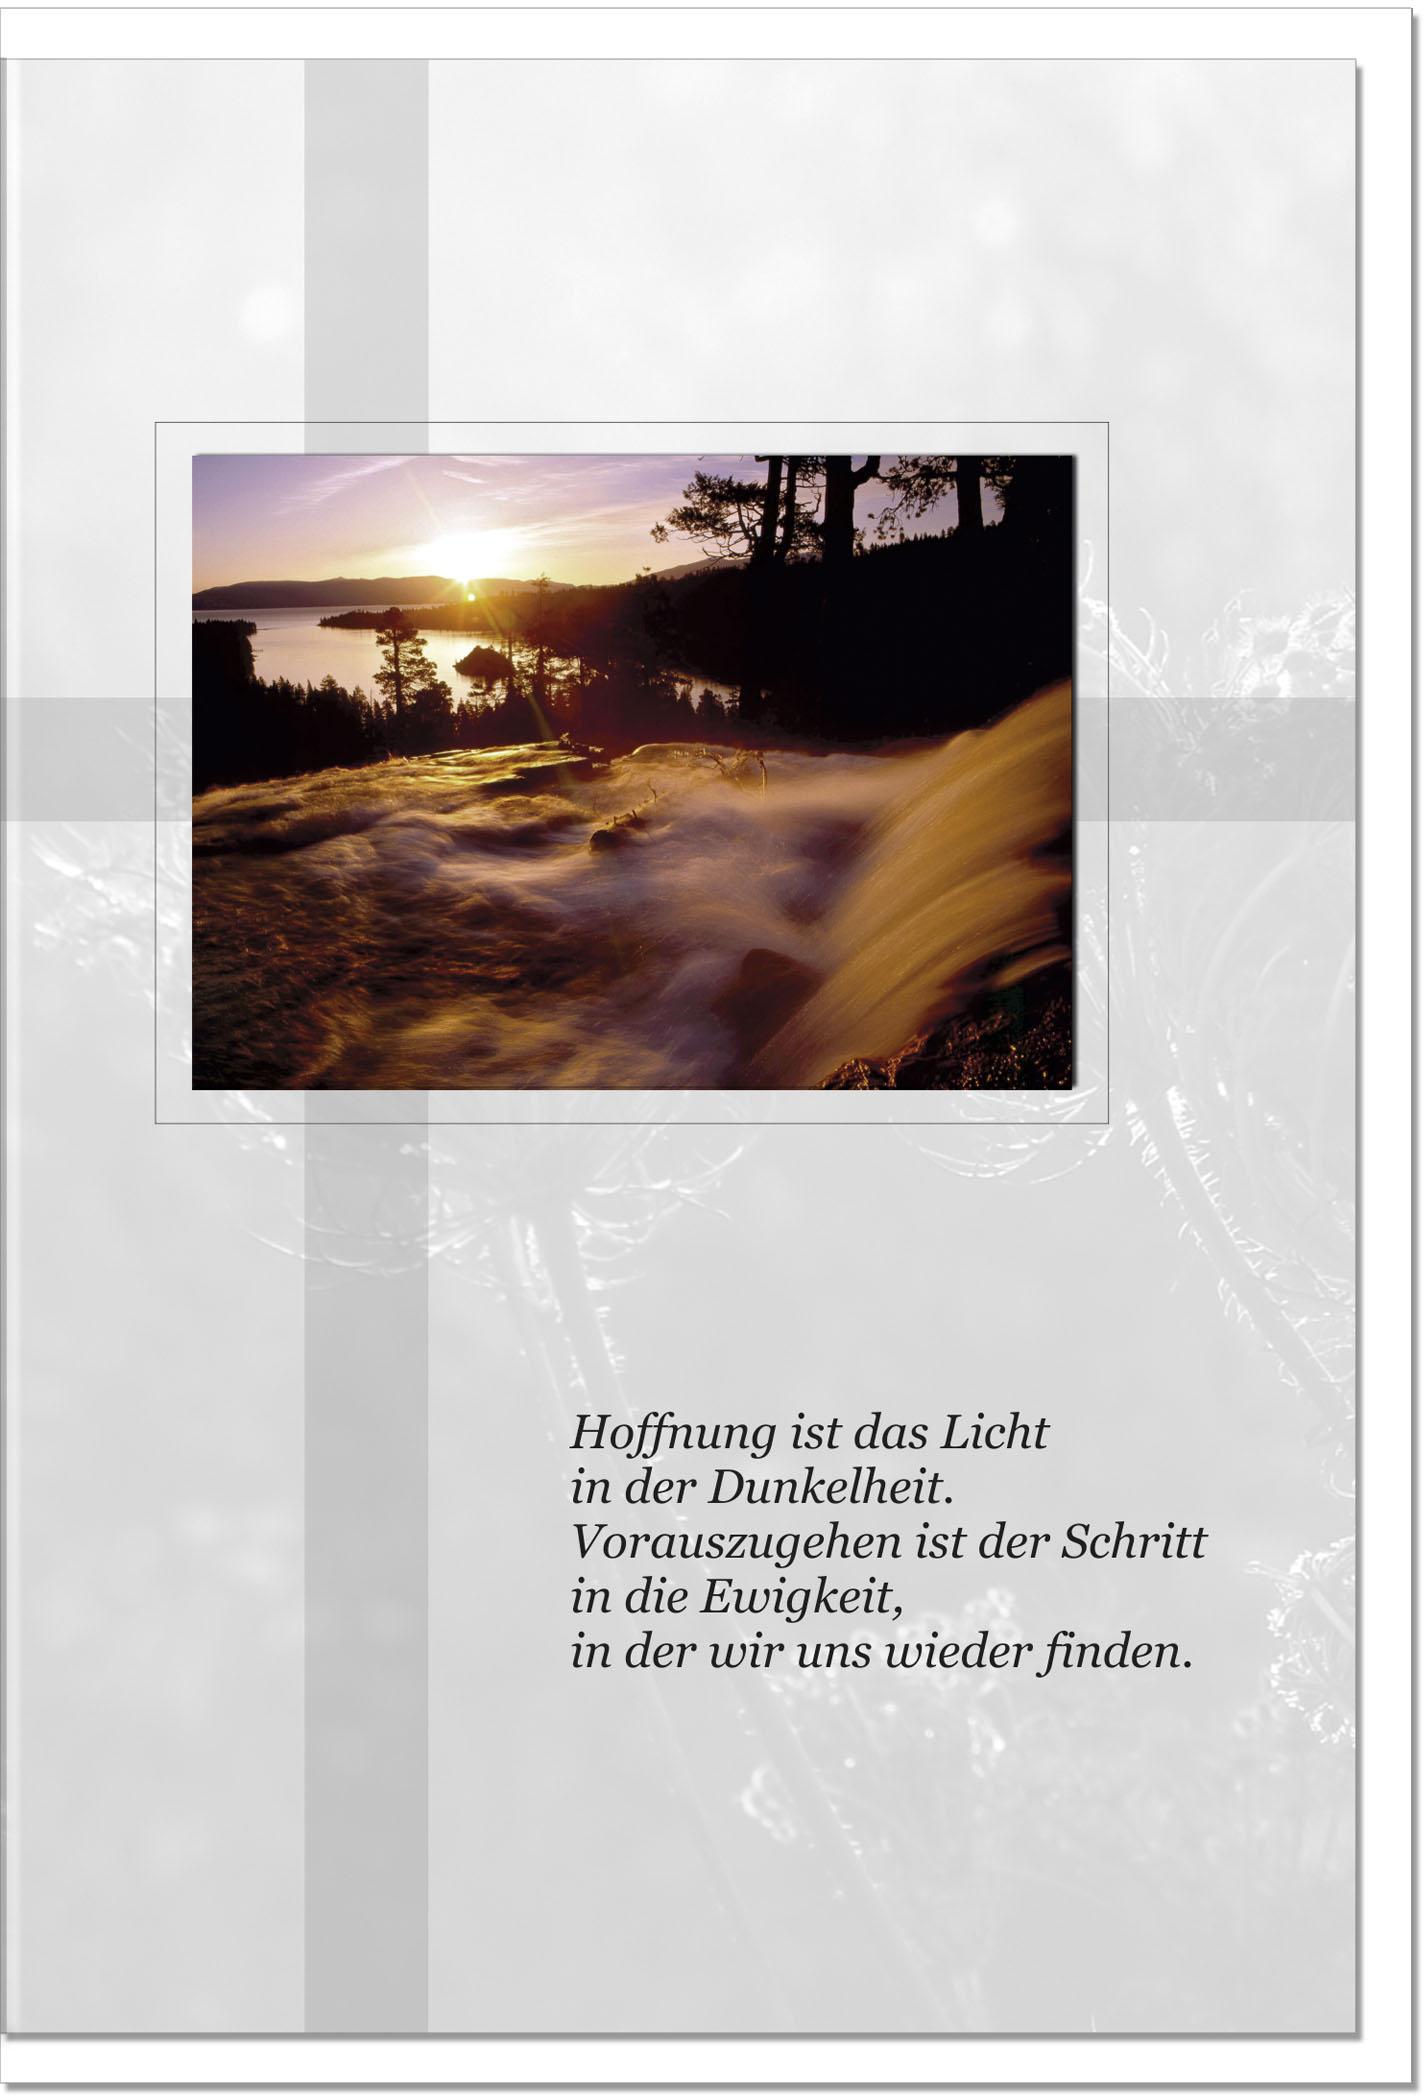 Trauerkarte Beileidskarte / Wasserfall